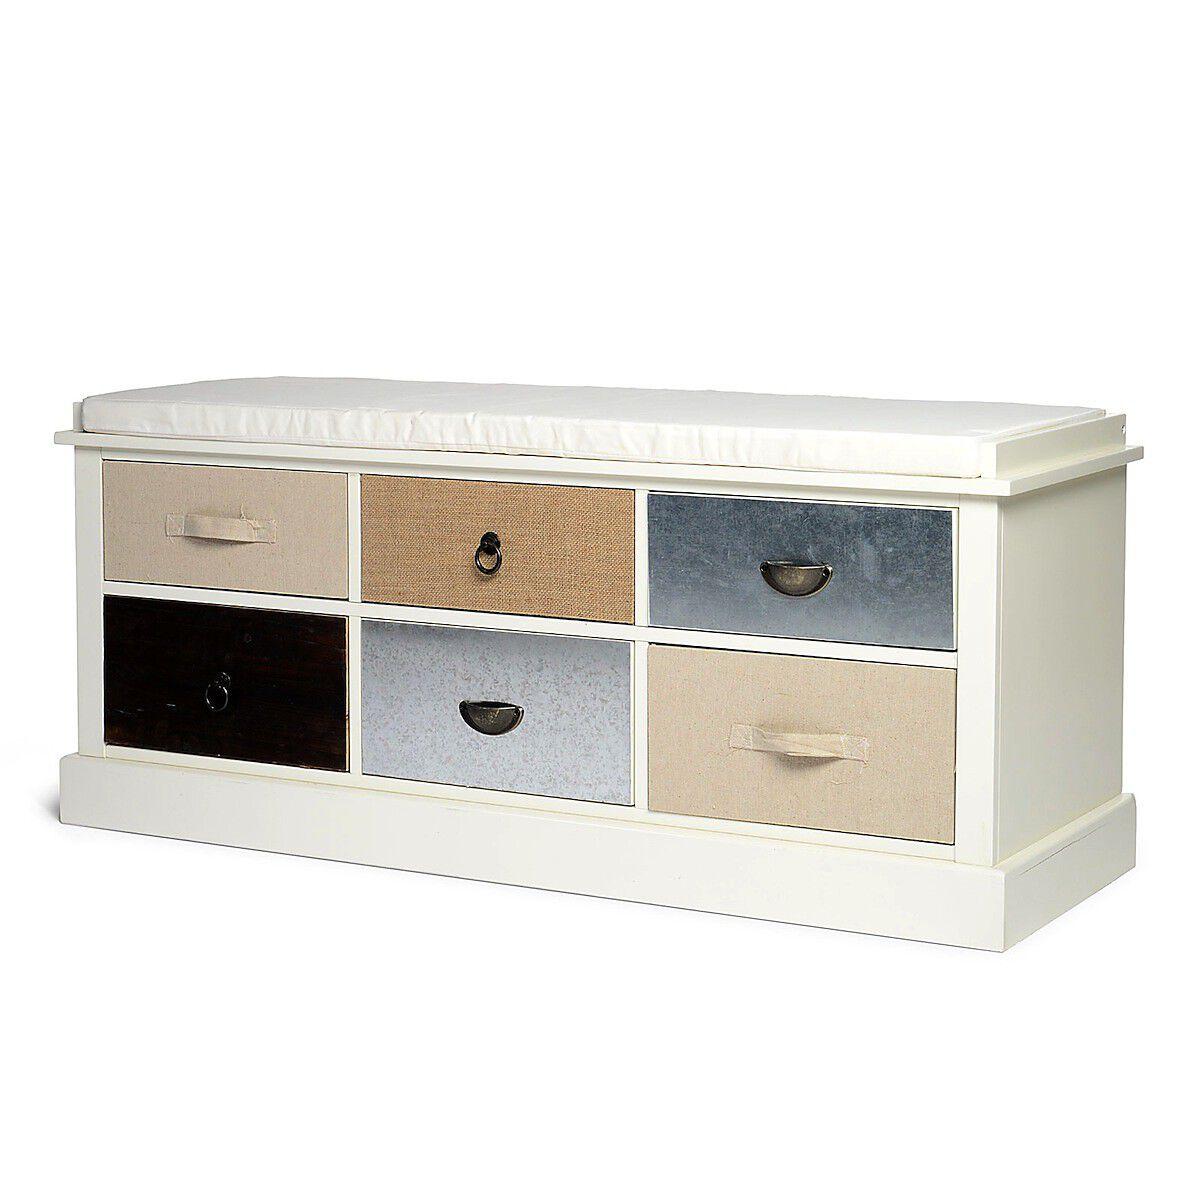 dielenbank ca l 120 x b 40 x h 50cm creme depot de. Black Bedroom Furniture Sets. Home Design Ideas